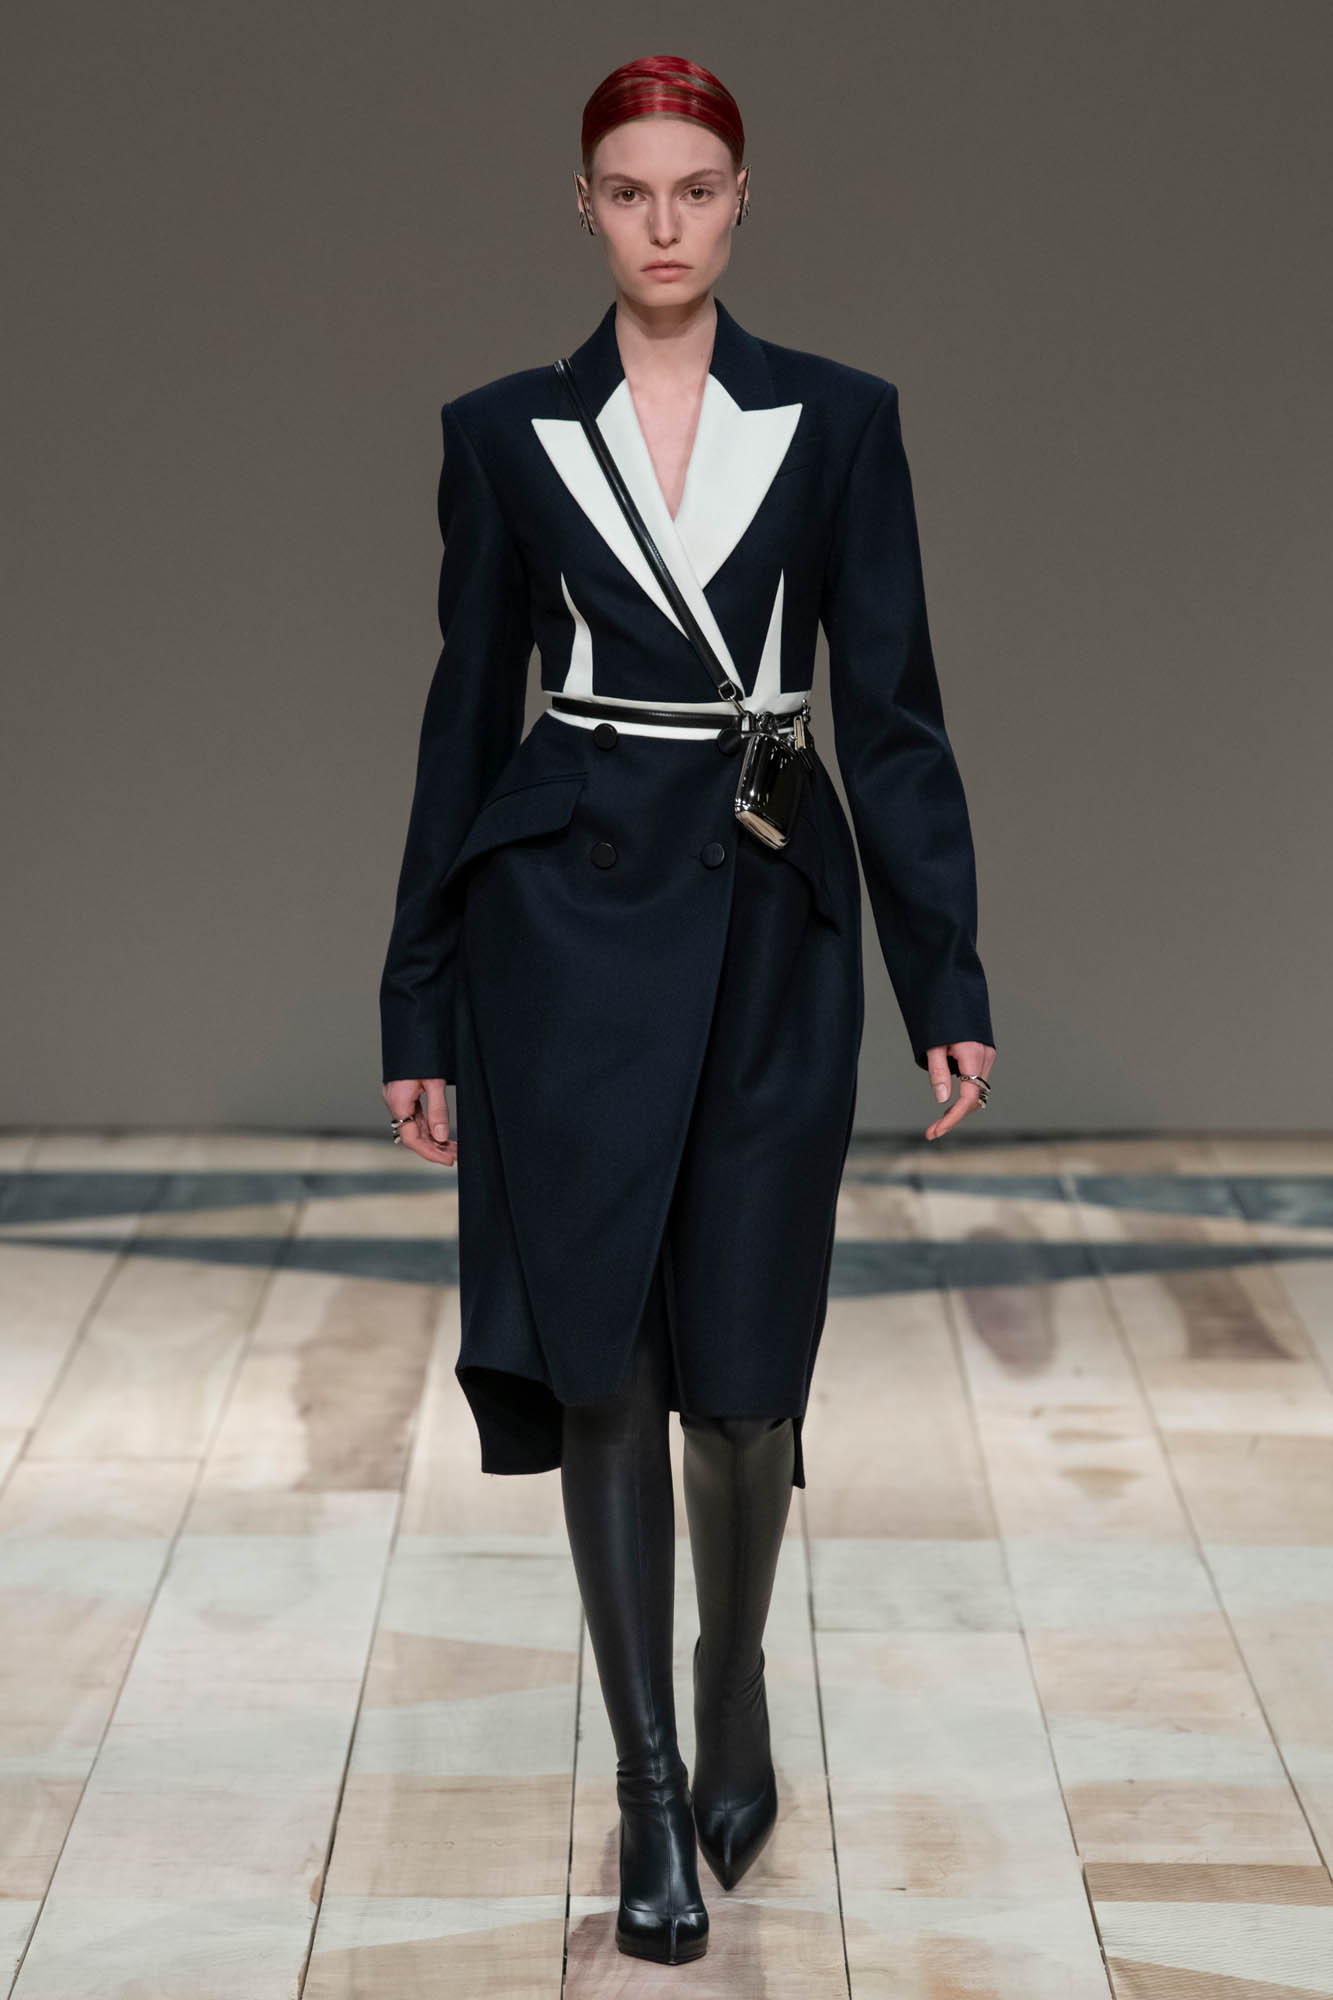 Alexander McQueen Fashion Show FW 2020